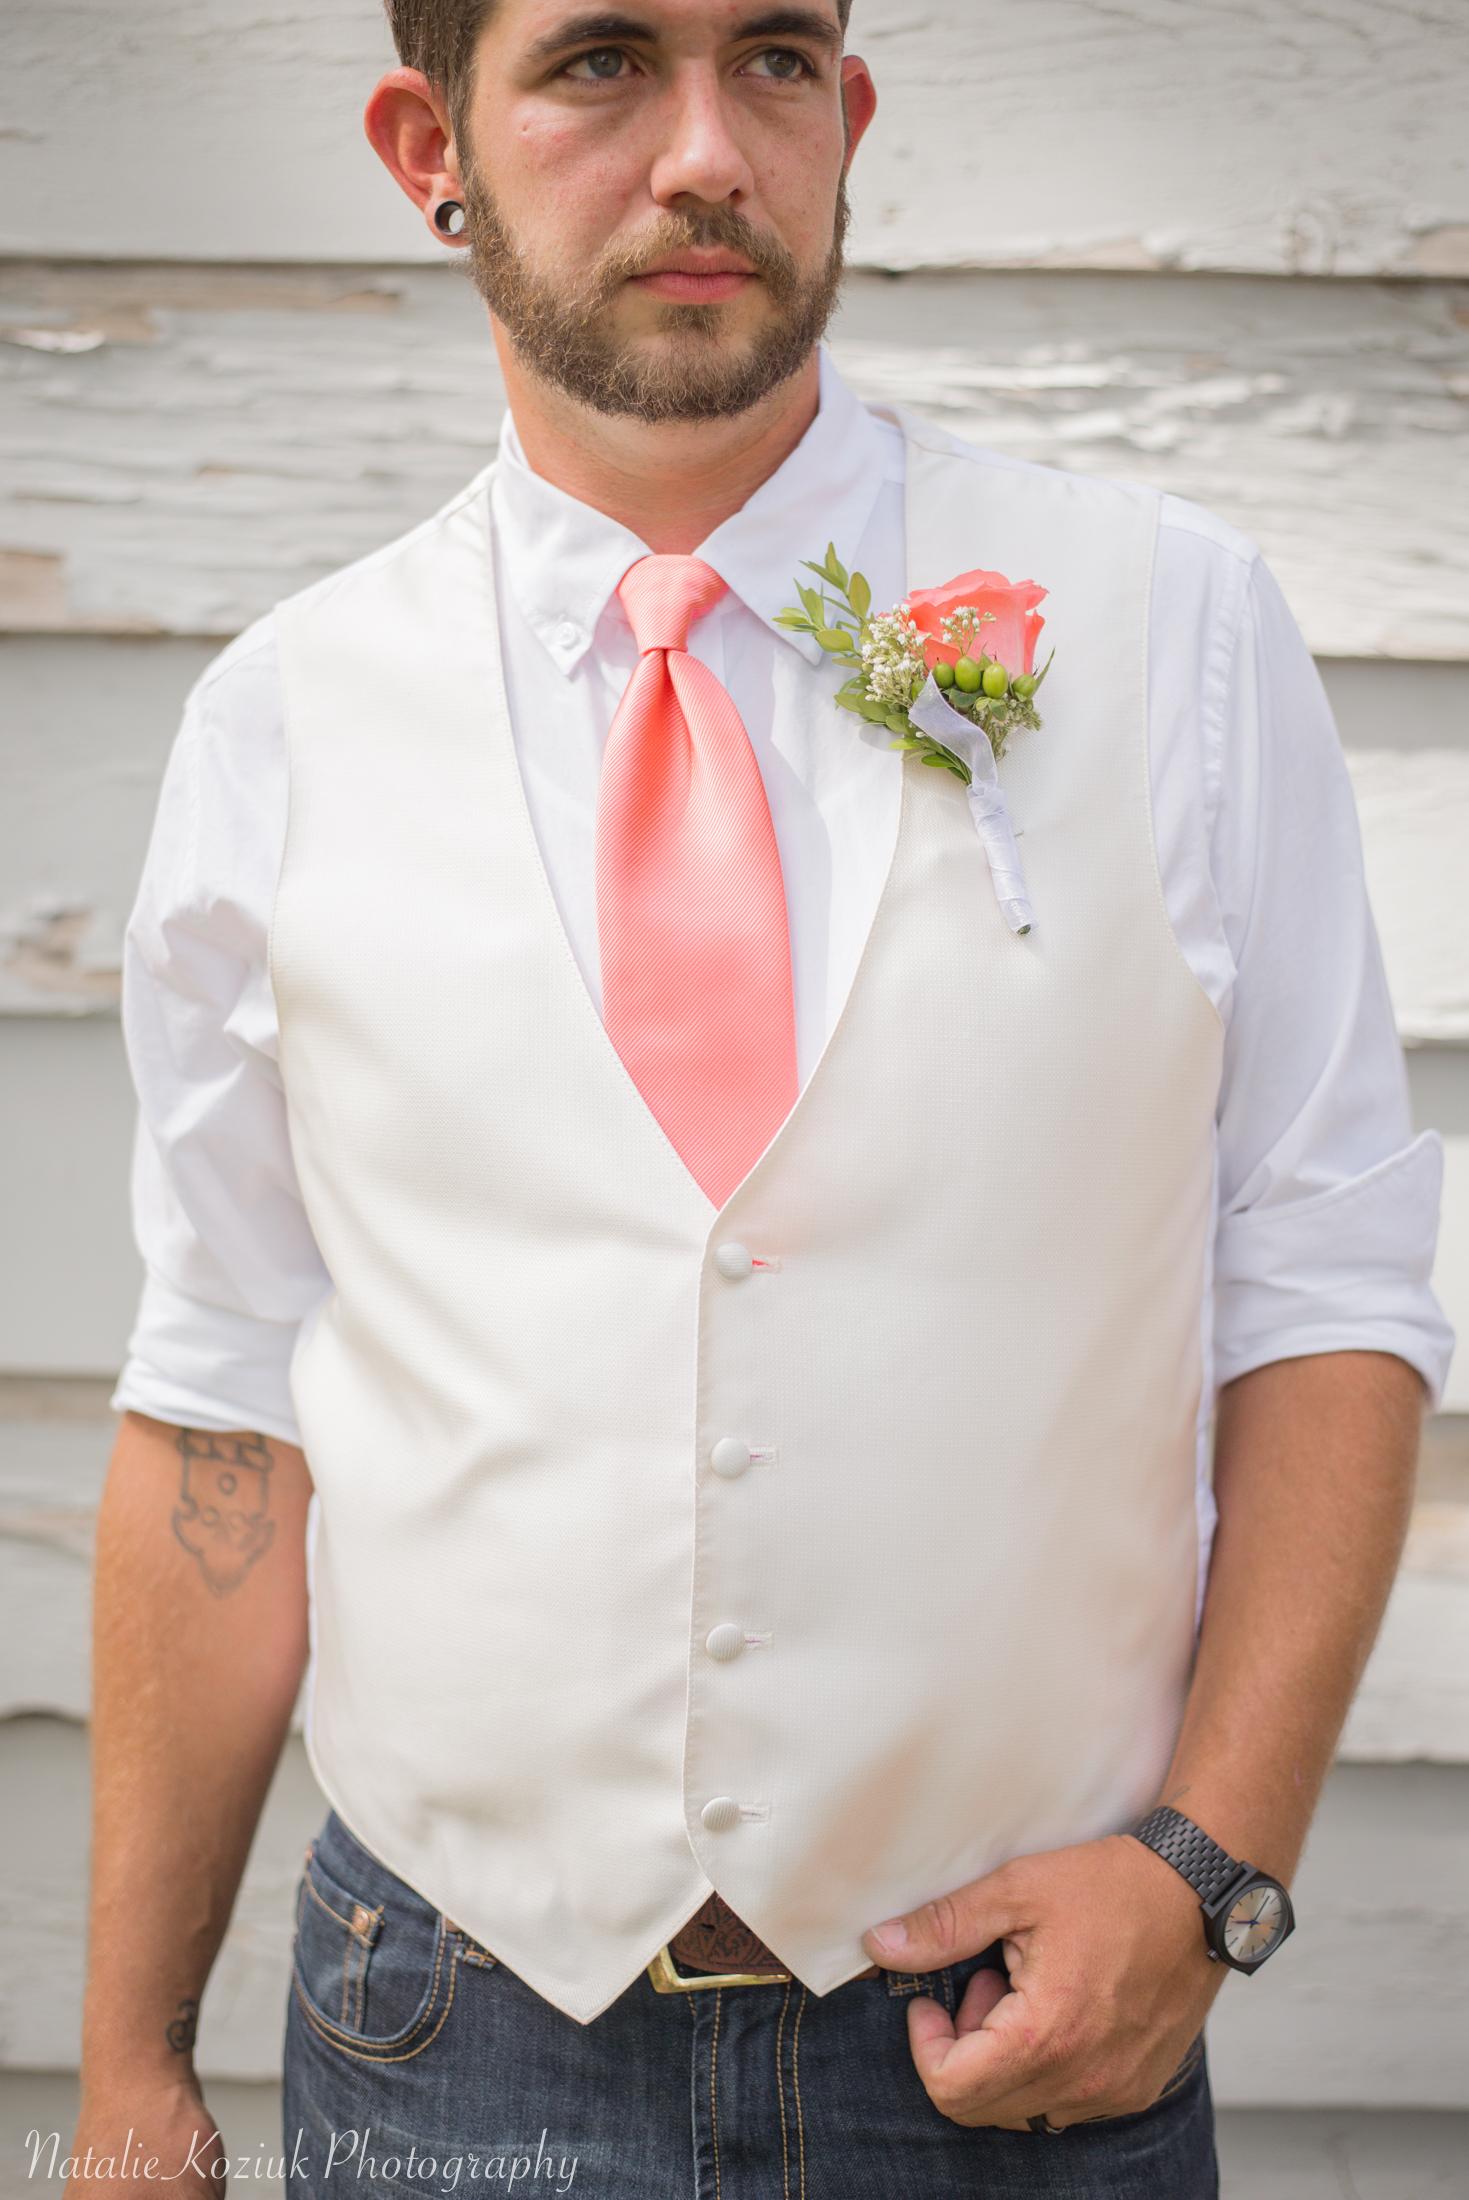 Natalie Koziuk Photography | Boise wedding photographer | groom | Star, ID | Bride Groom | nkoziukphotography.com